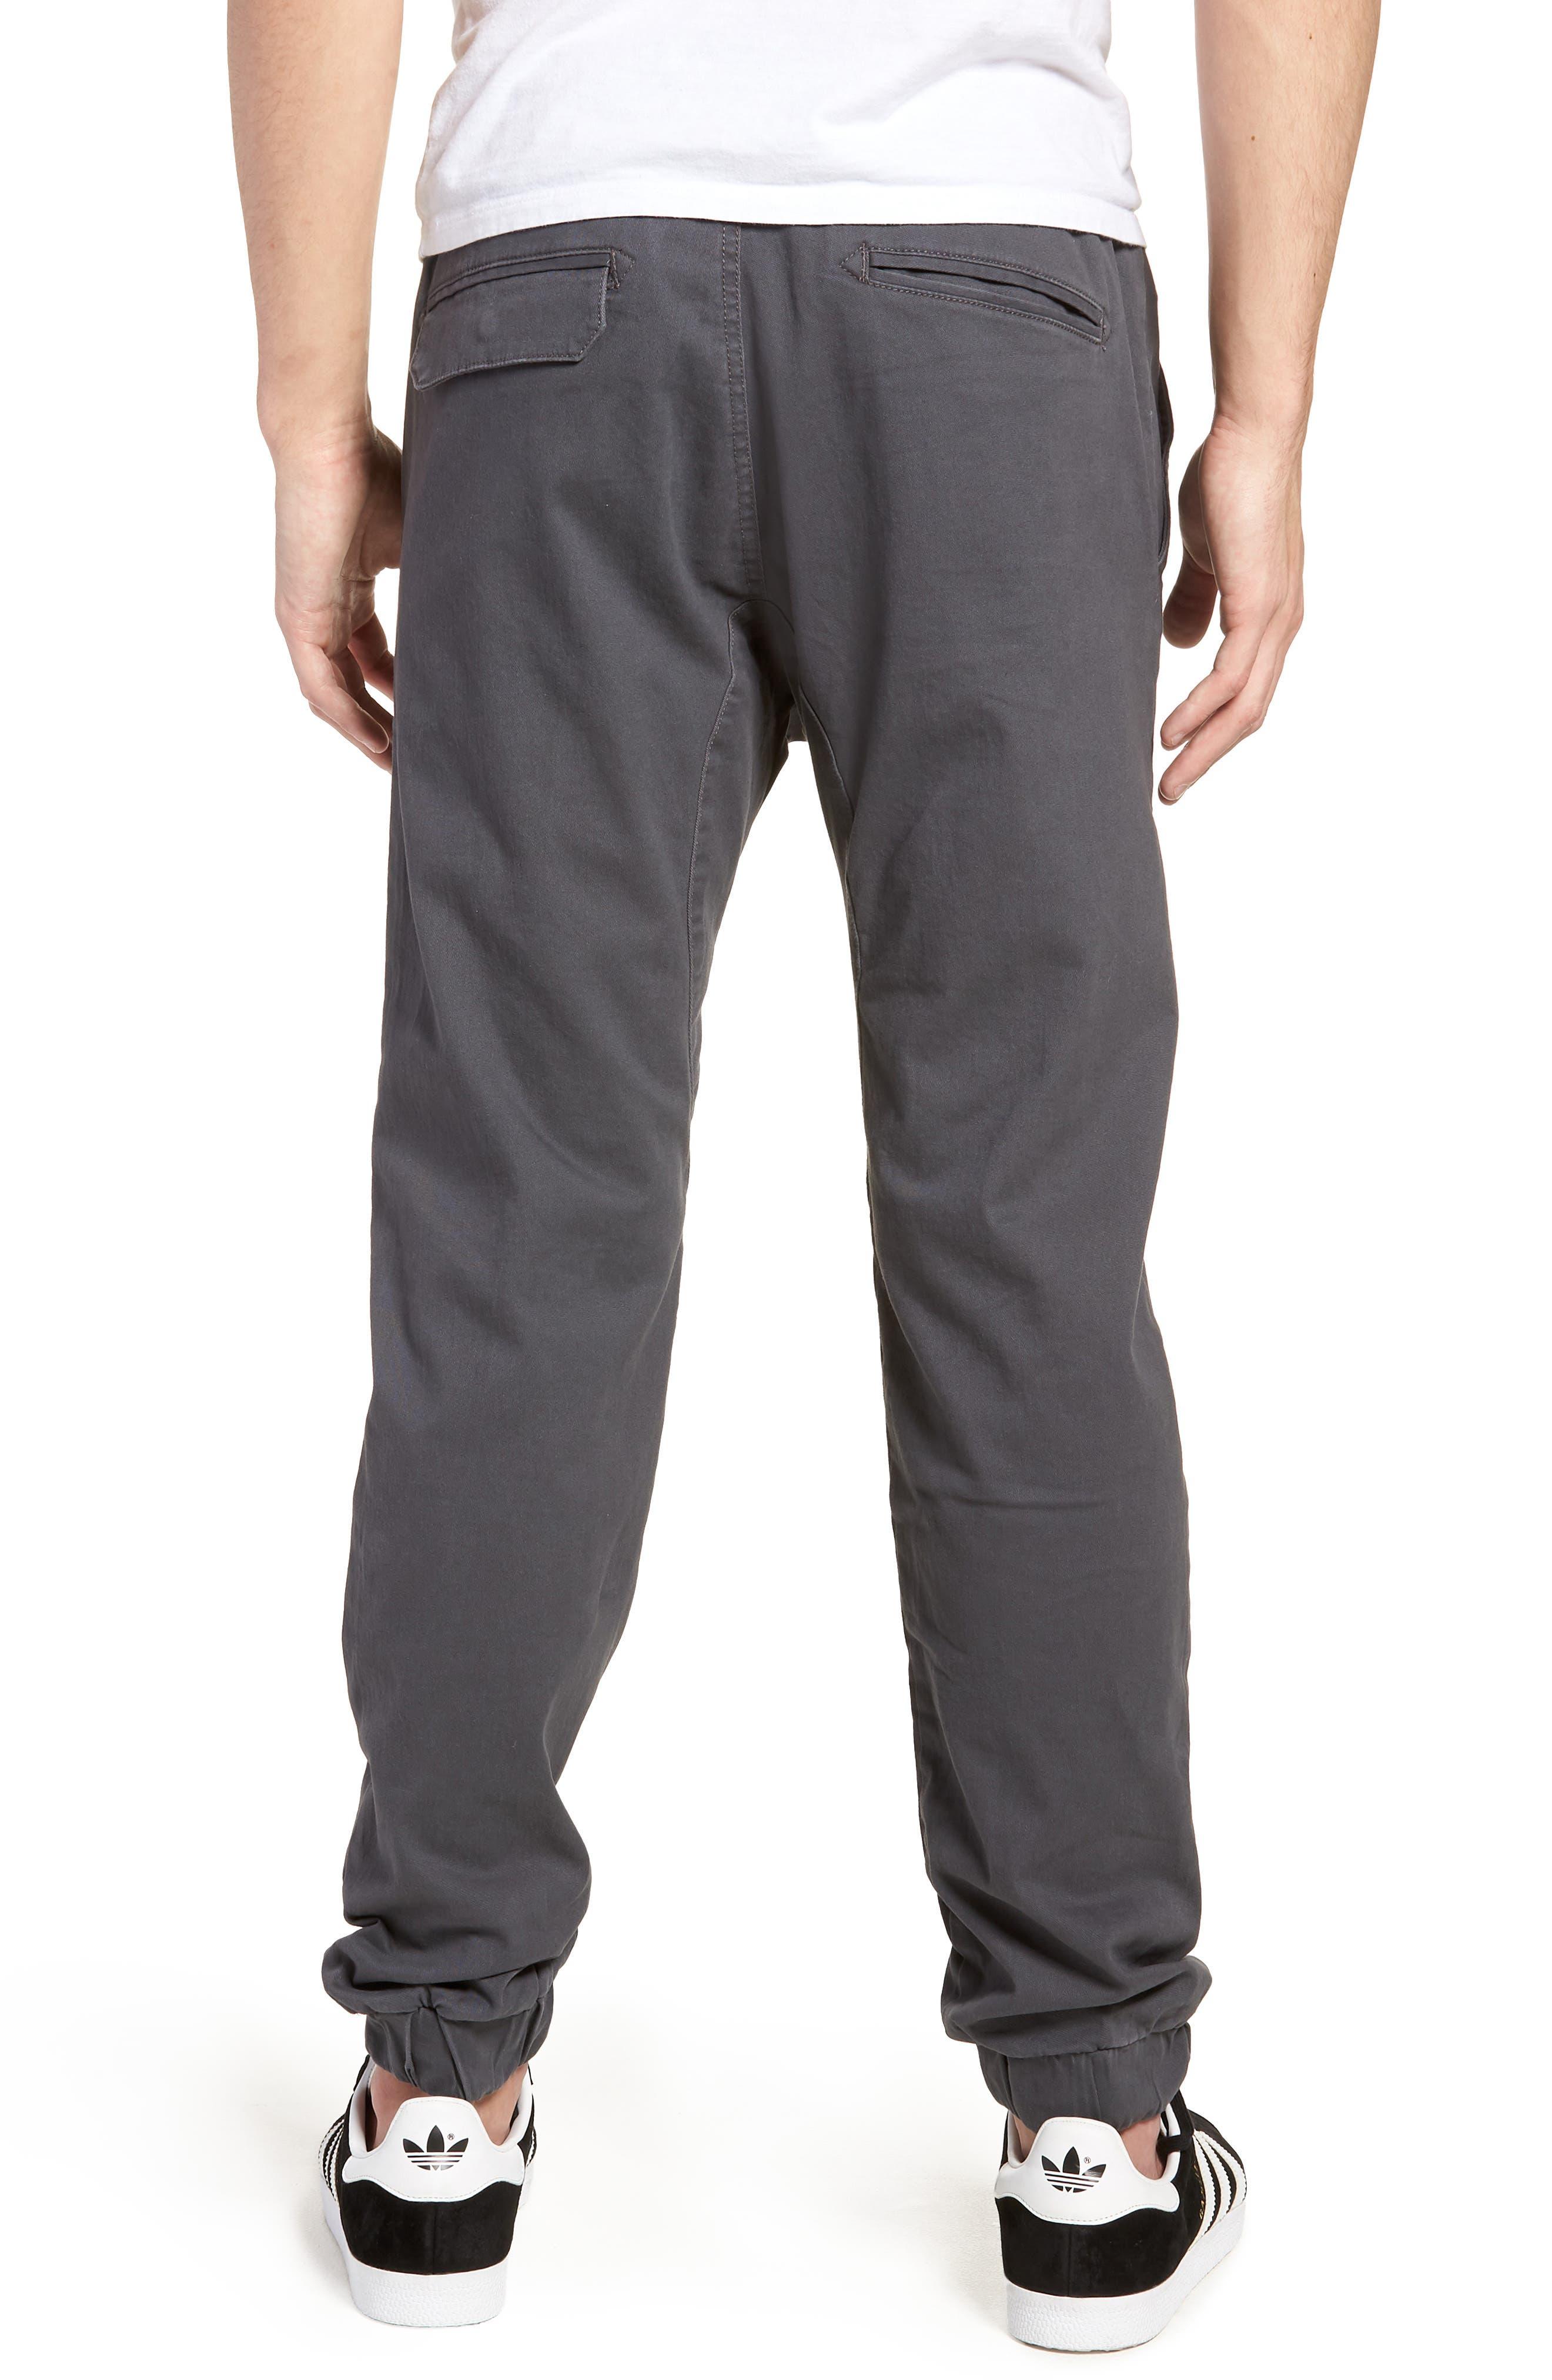 Jogger Pants,                             Alternate thumbnail 2, color,                             Grey Onyx